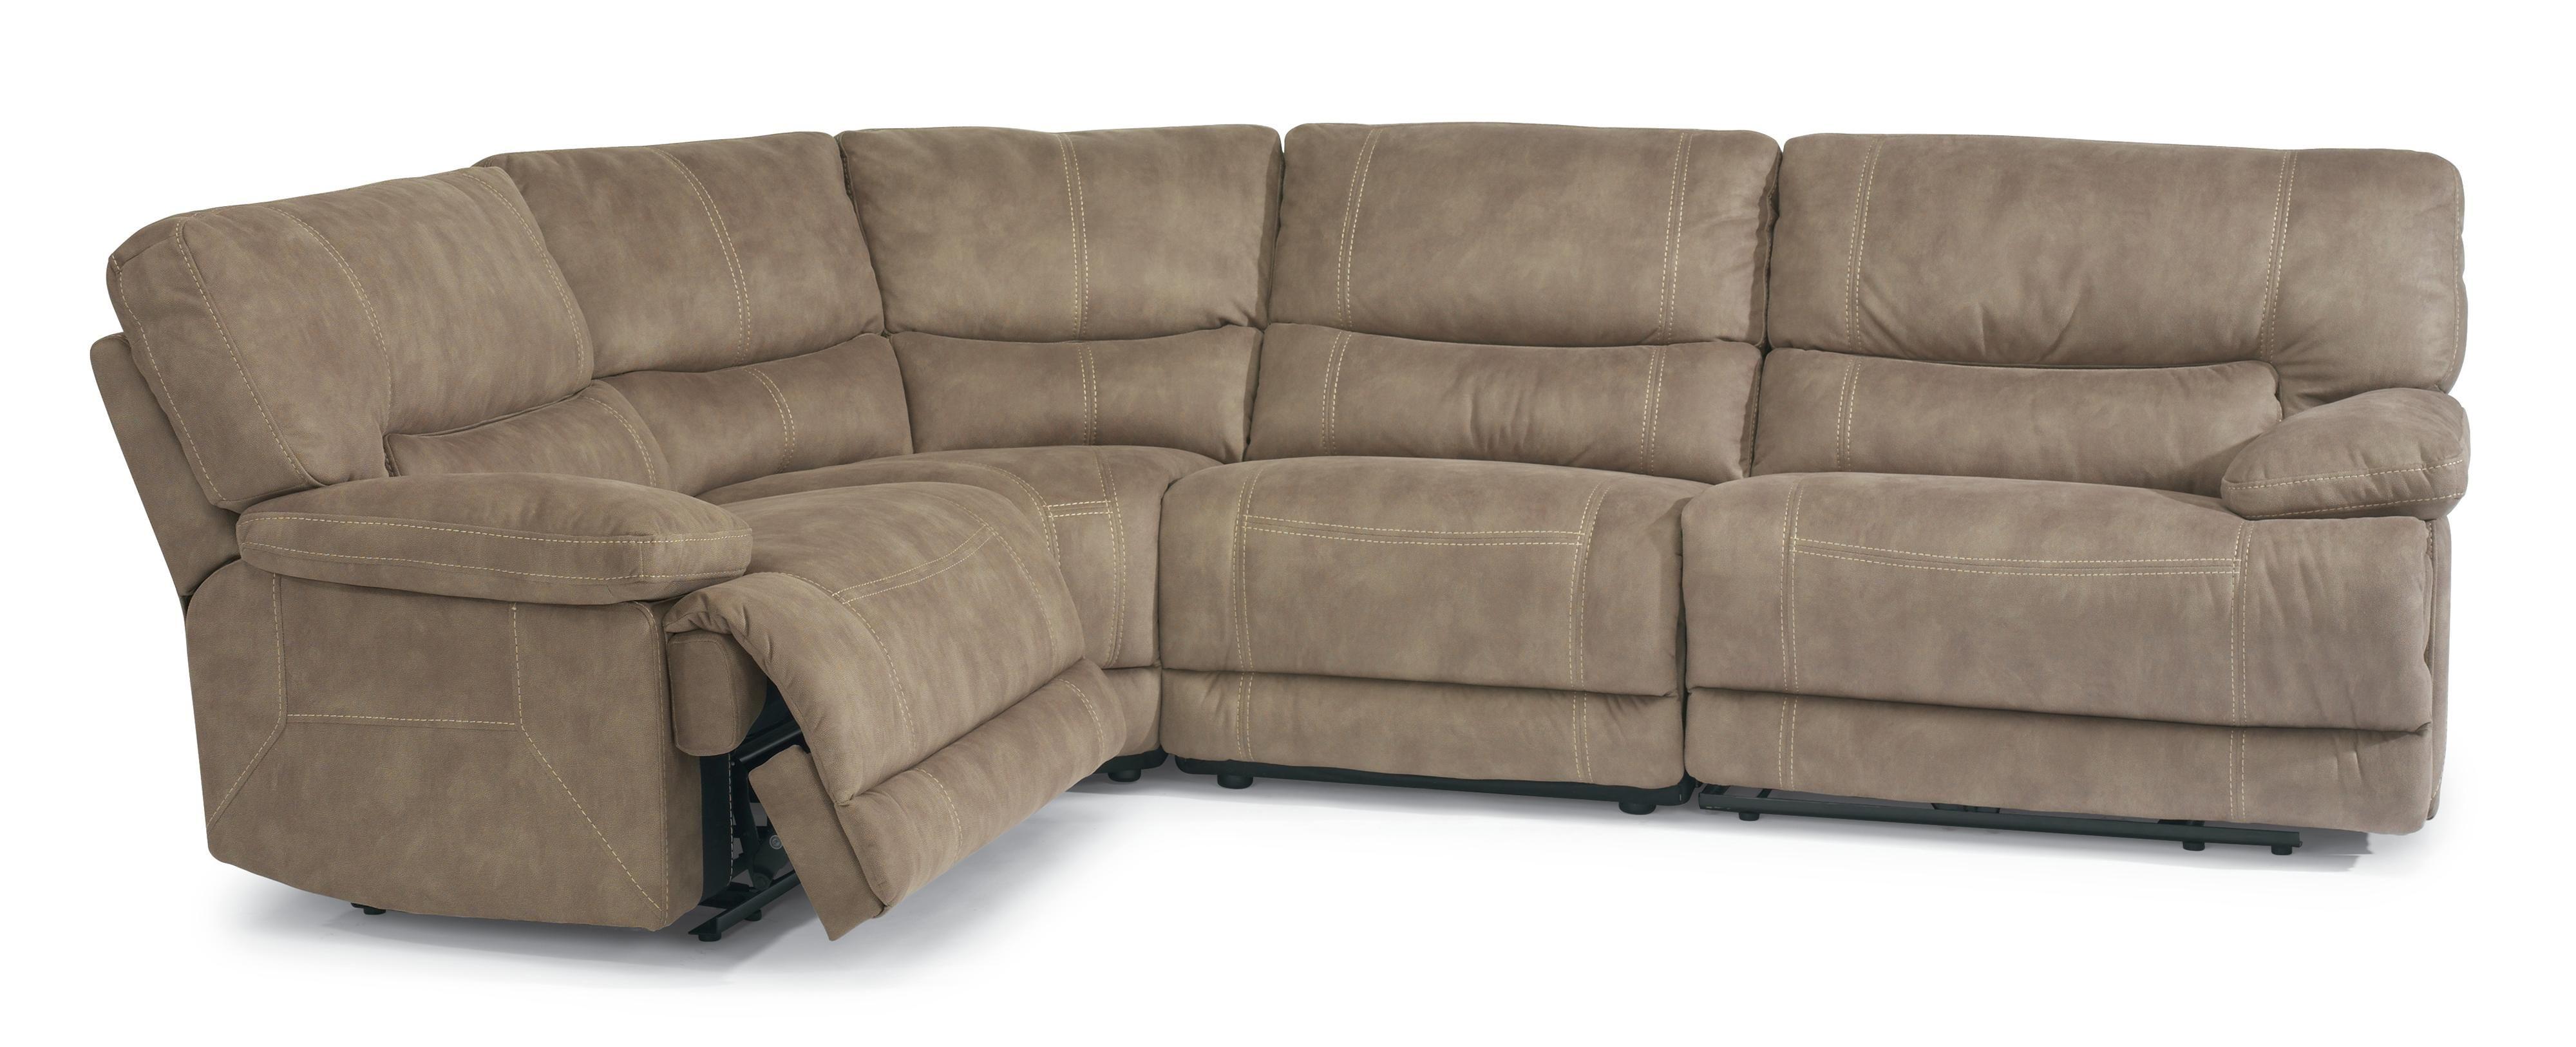 Pasadena Reclining Sectional Sofa By Flexsteel At Crowley